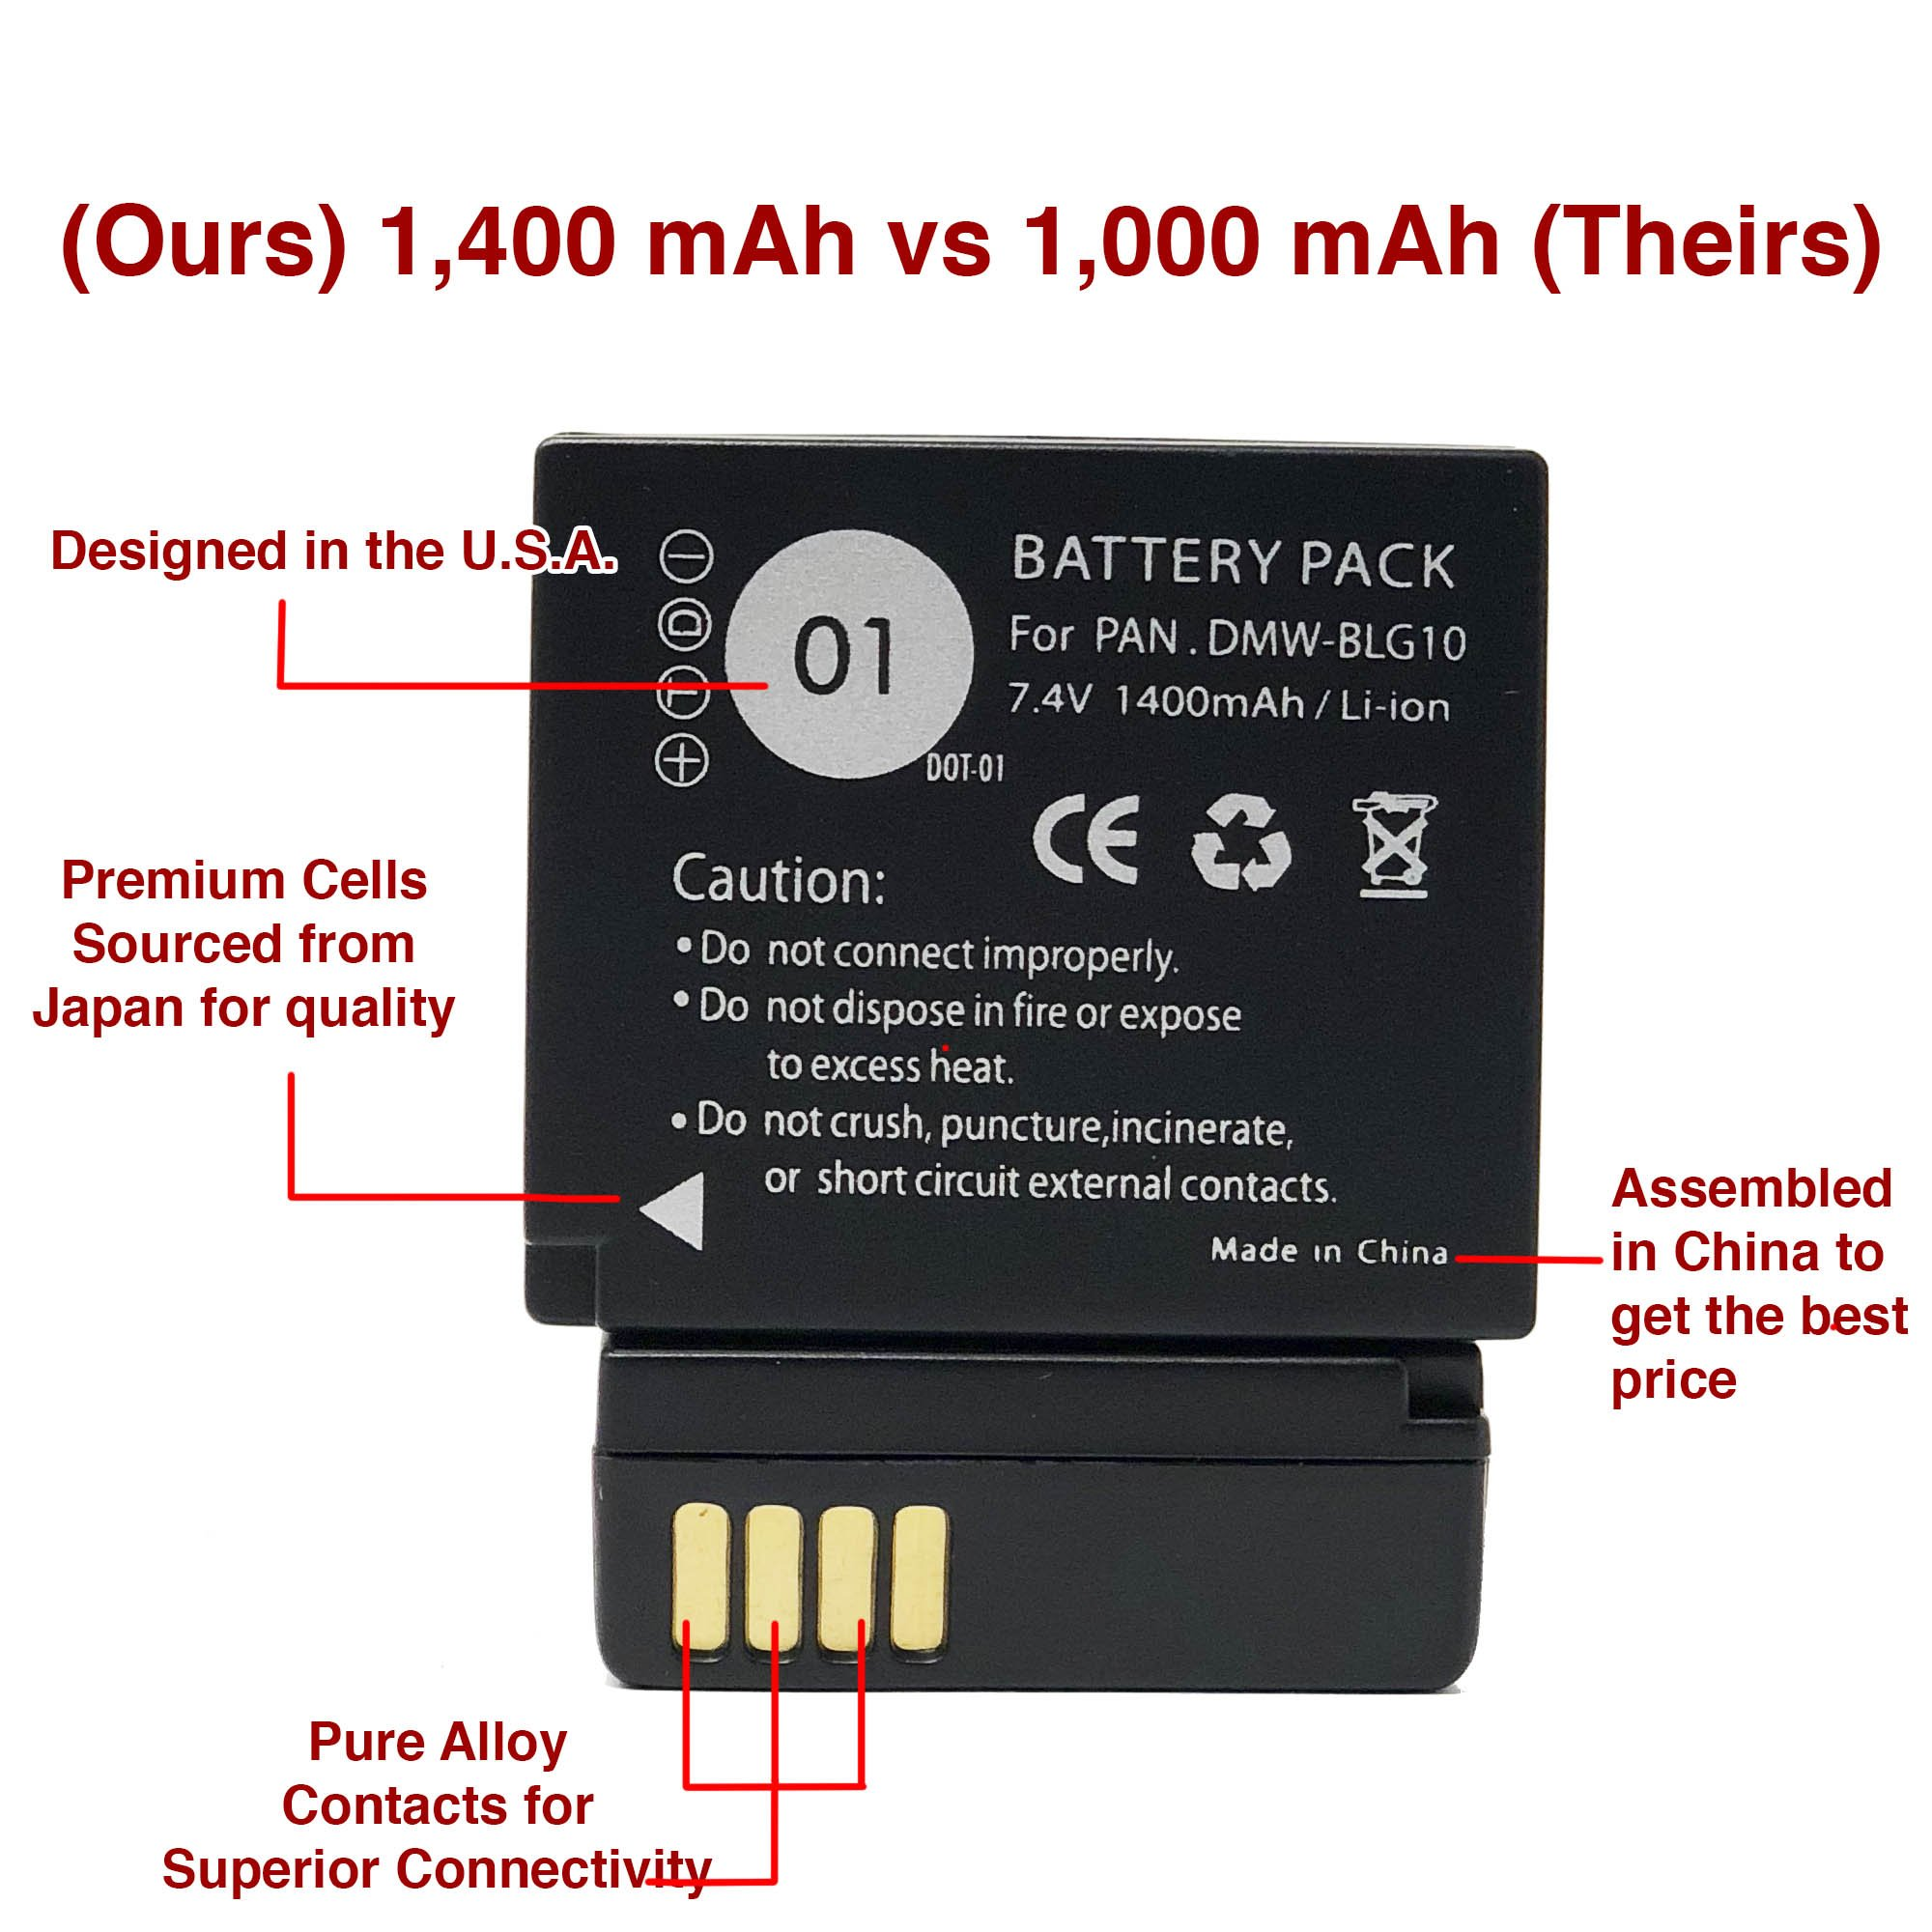 DOT-01 Brand Panasonic Lumix DC-ZS70 Battery and Charger for Panasonic Lumix DC-ZS70 4K Digital Camera and Panasonic ZS70 Battery and Charger Bundle for Panasonic BLG10 DMW-BLG10